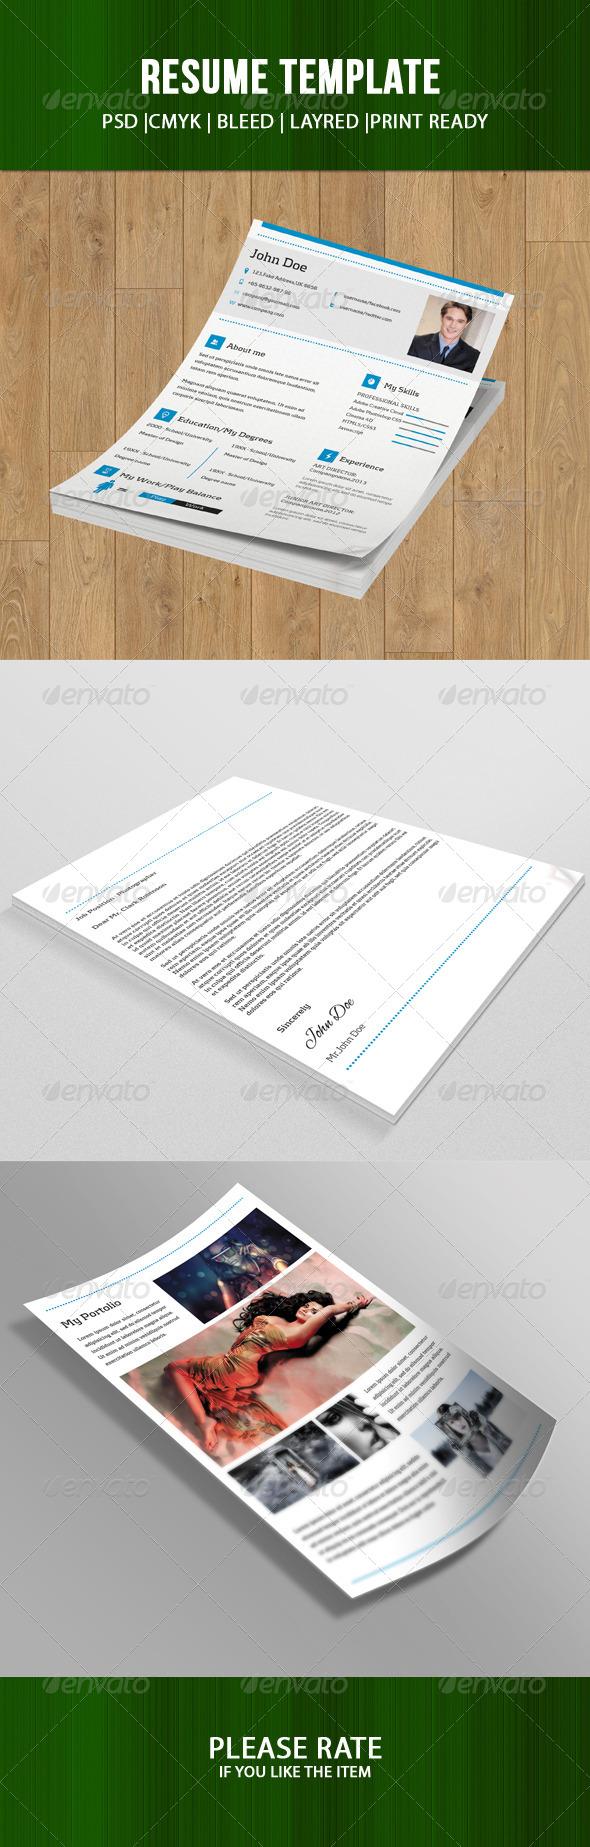 Resume Template-V04